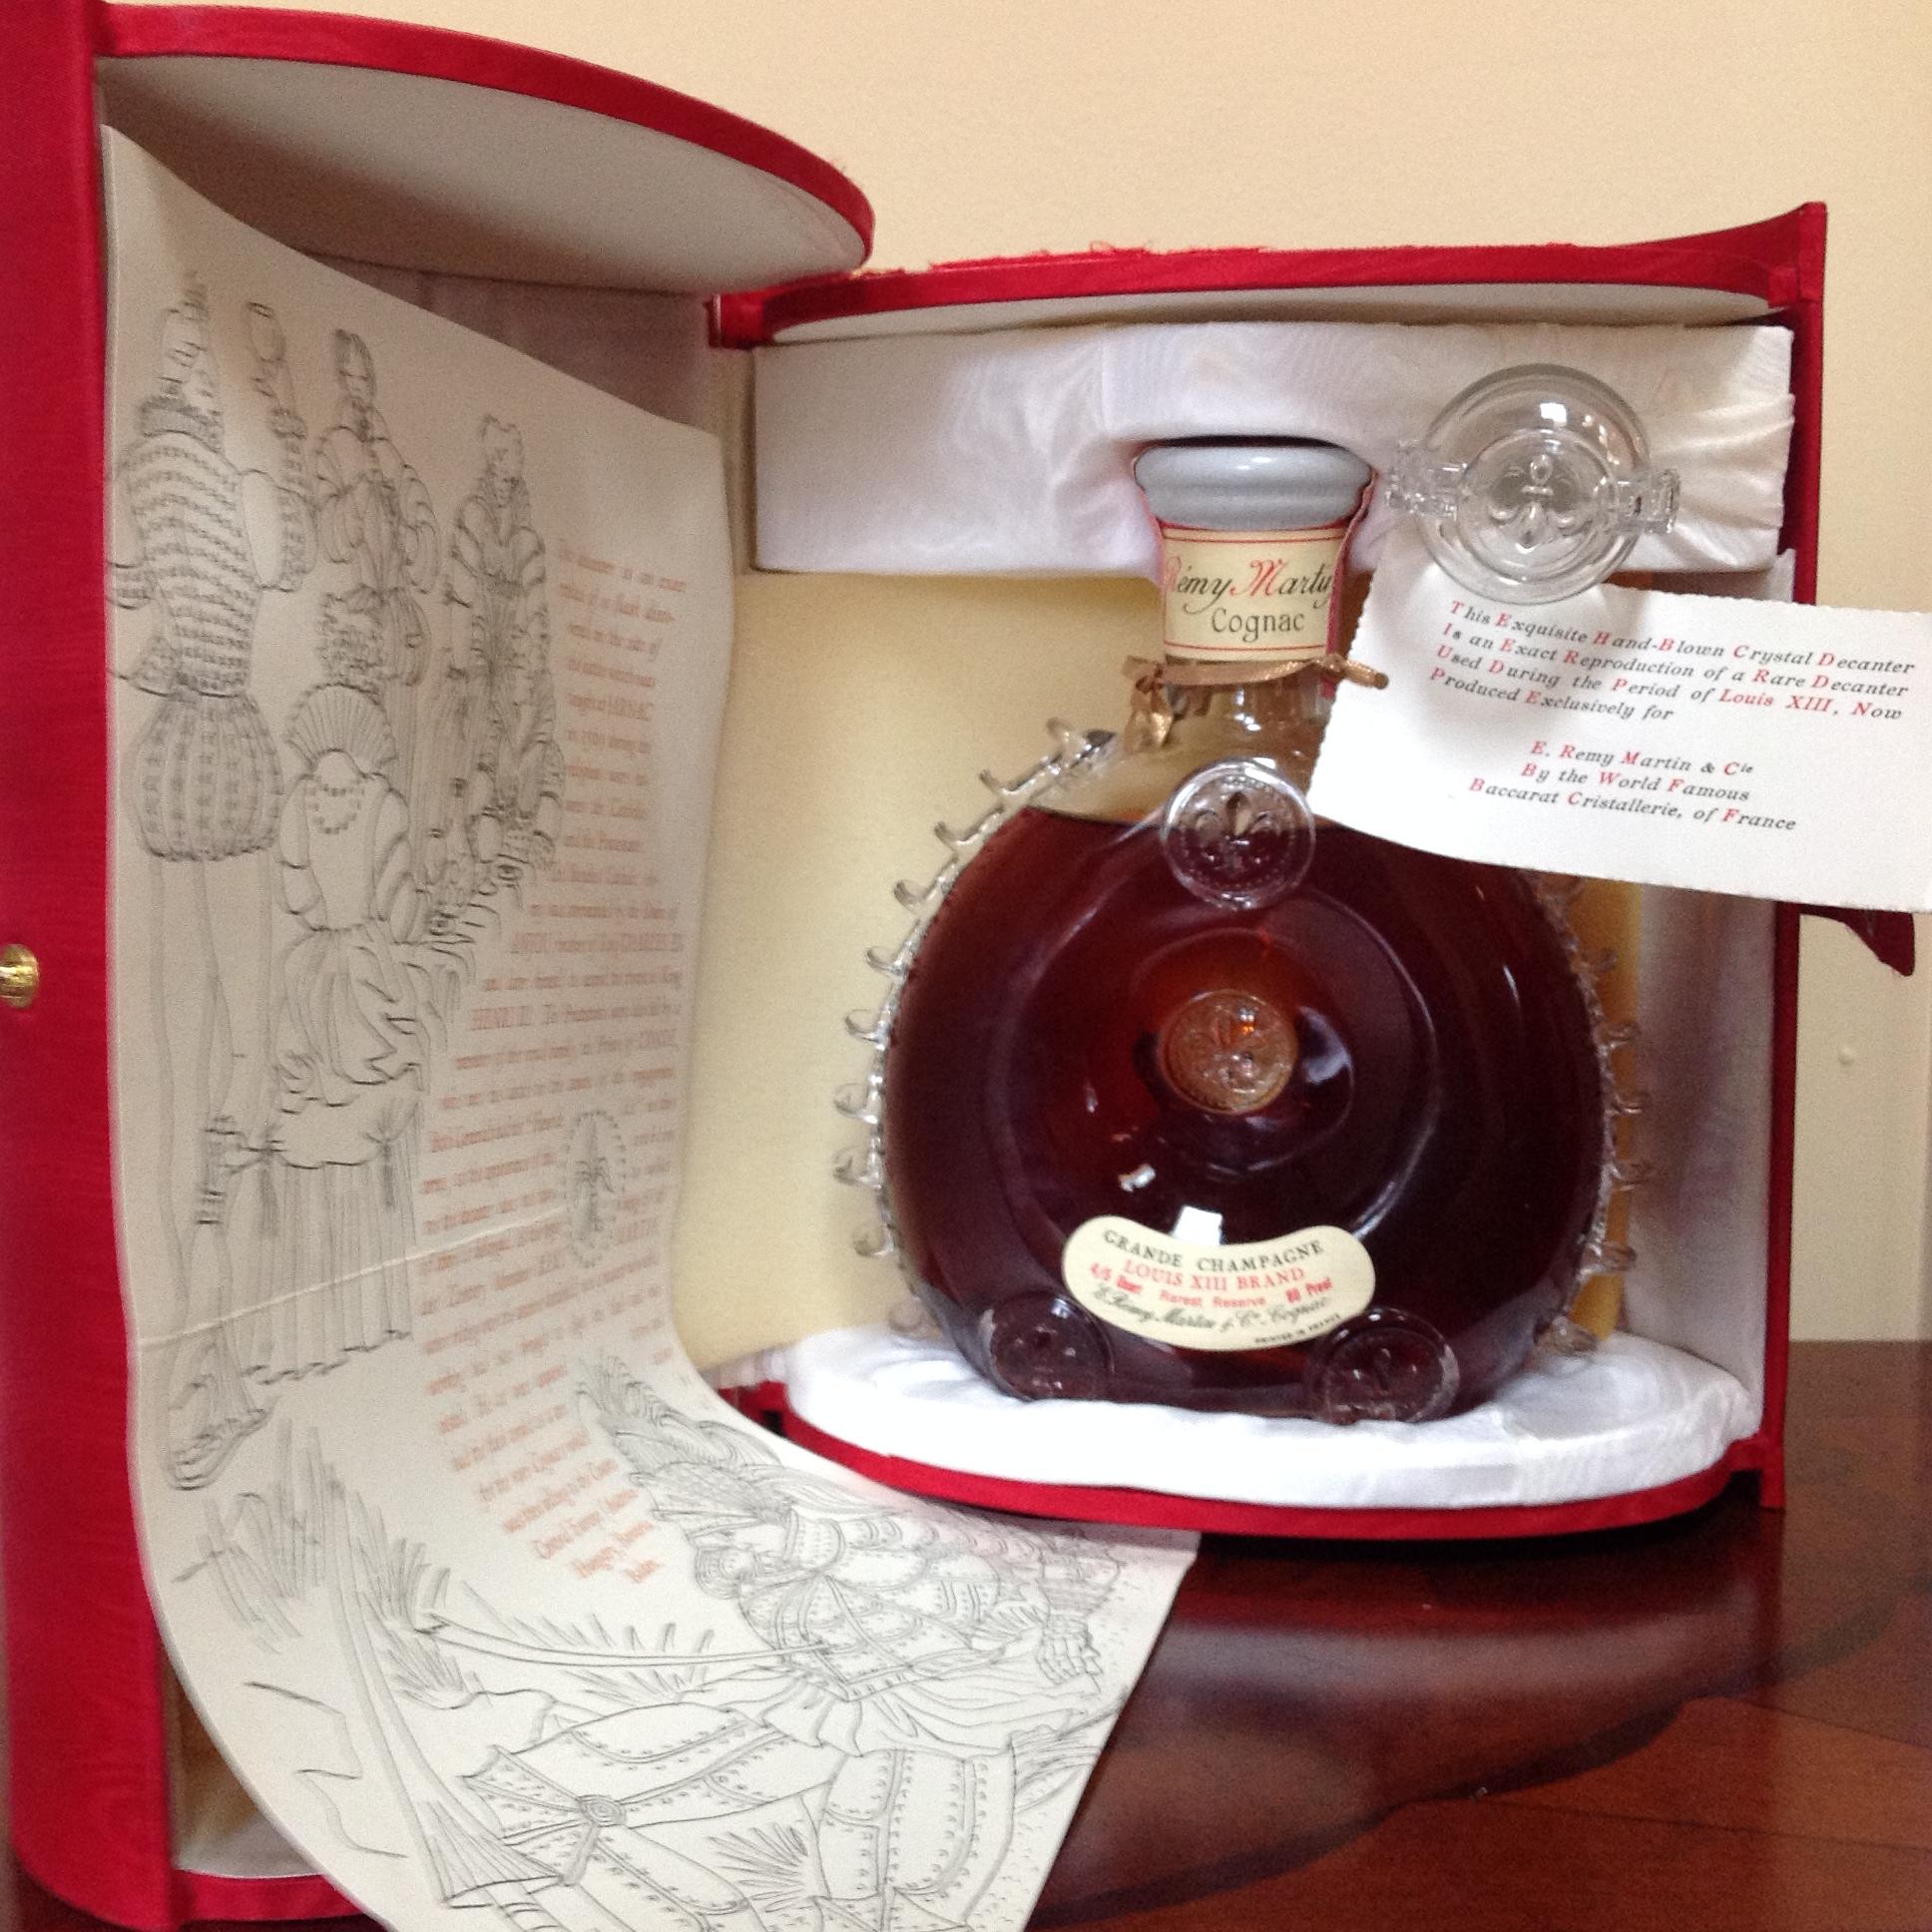 Rémy Martin Louis XIII Grand Champagne Cognac